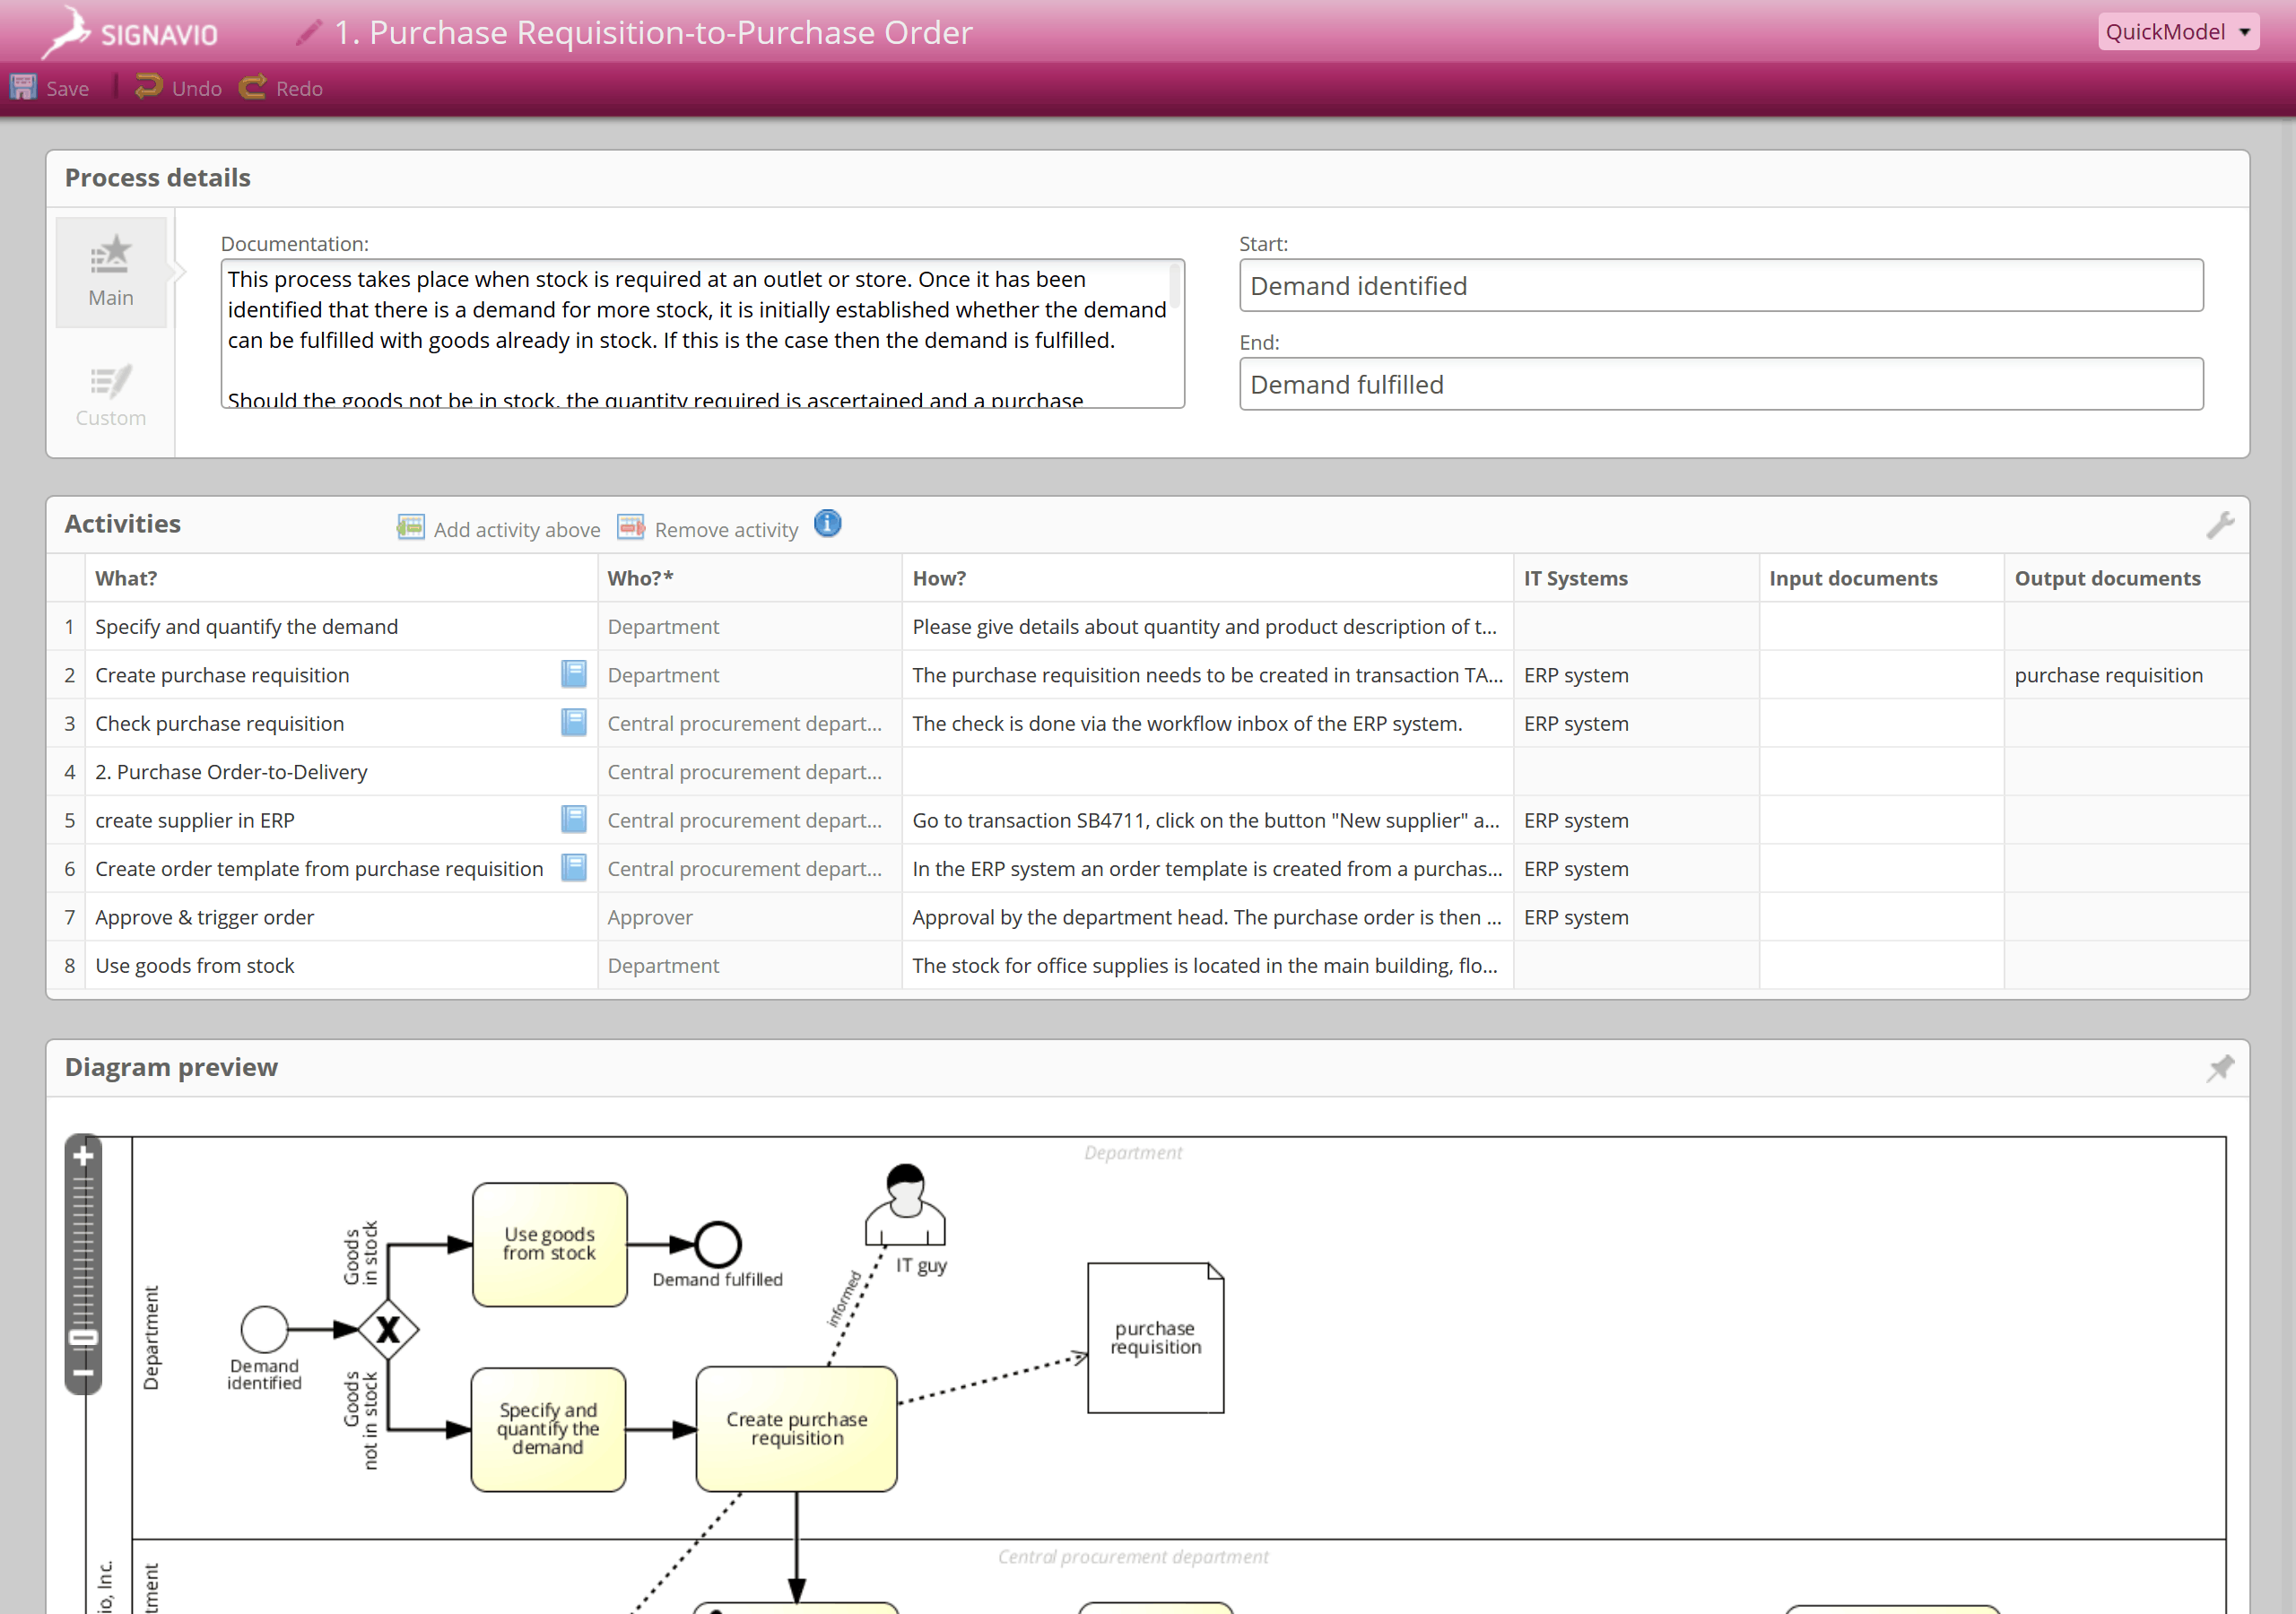 Screenshot Signavio QuickModel